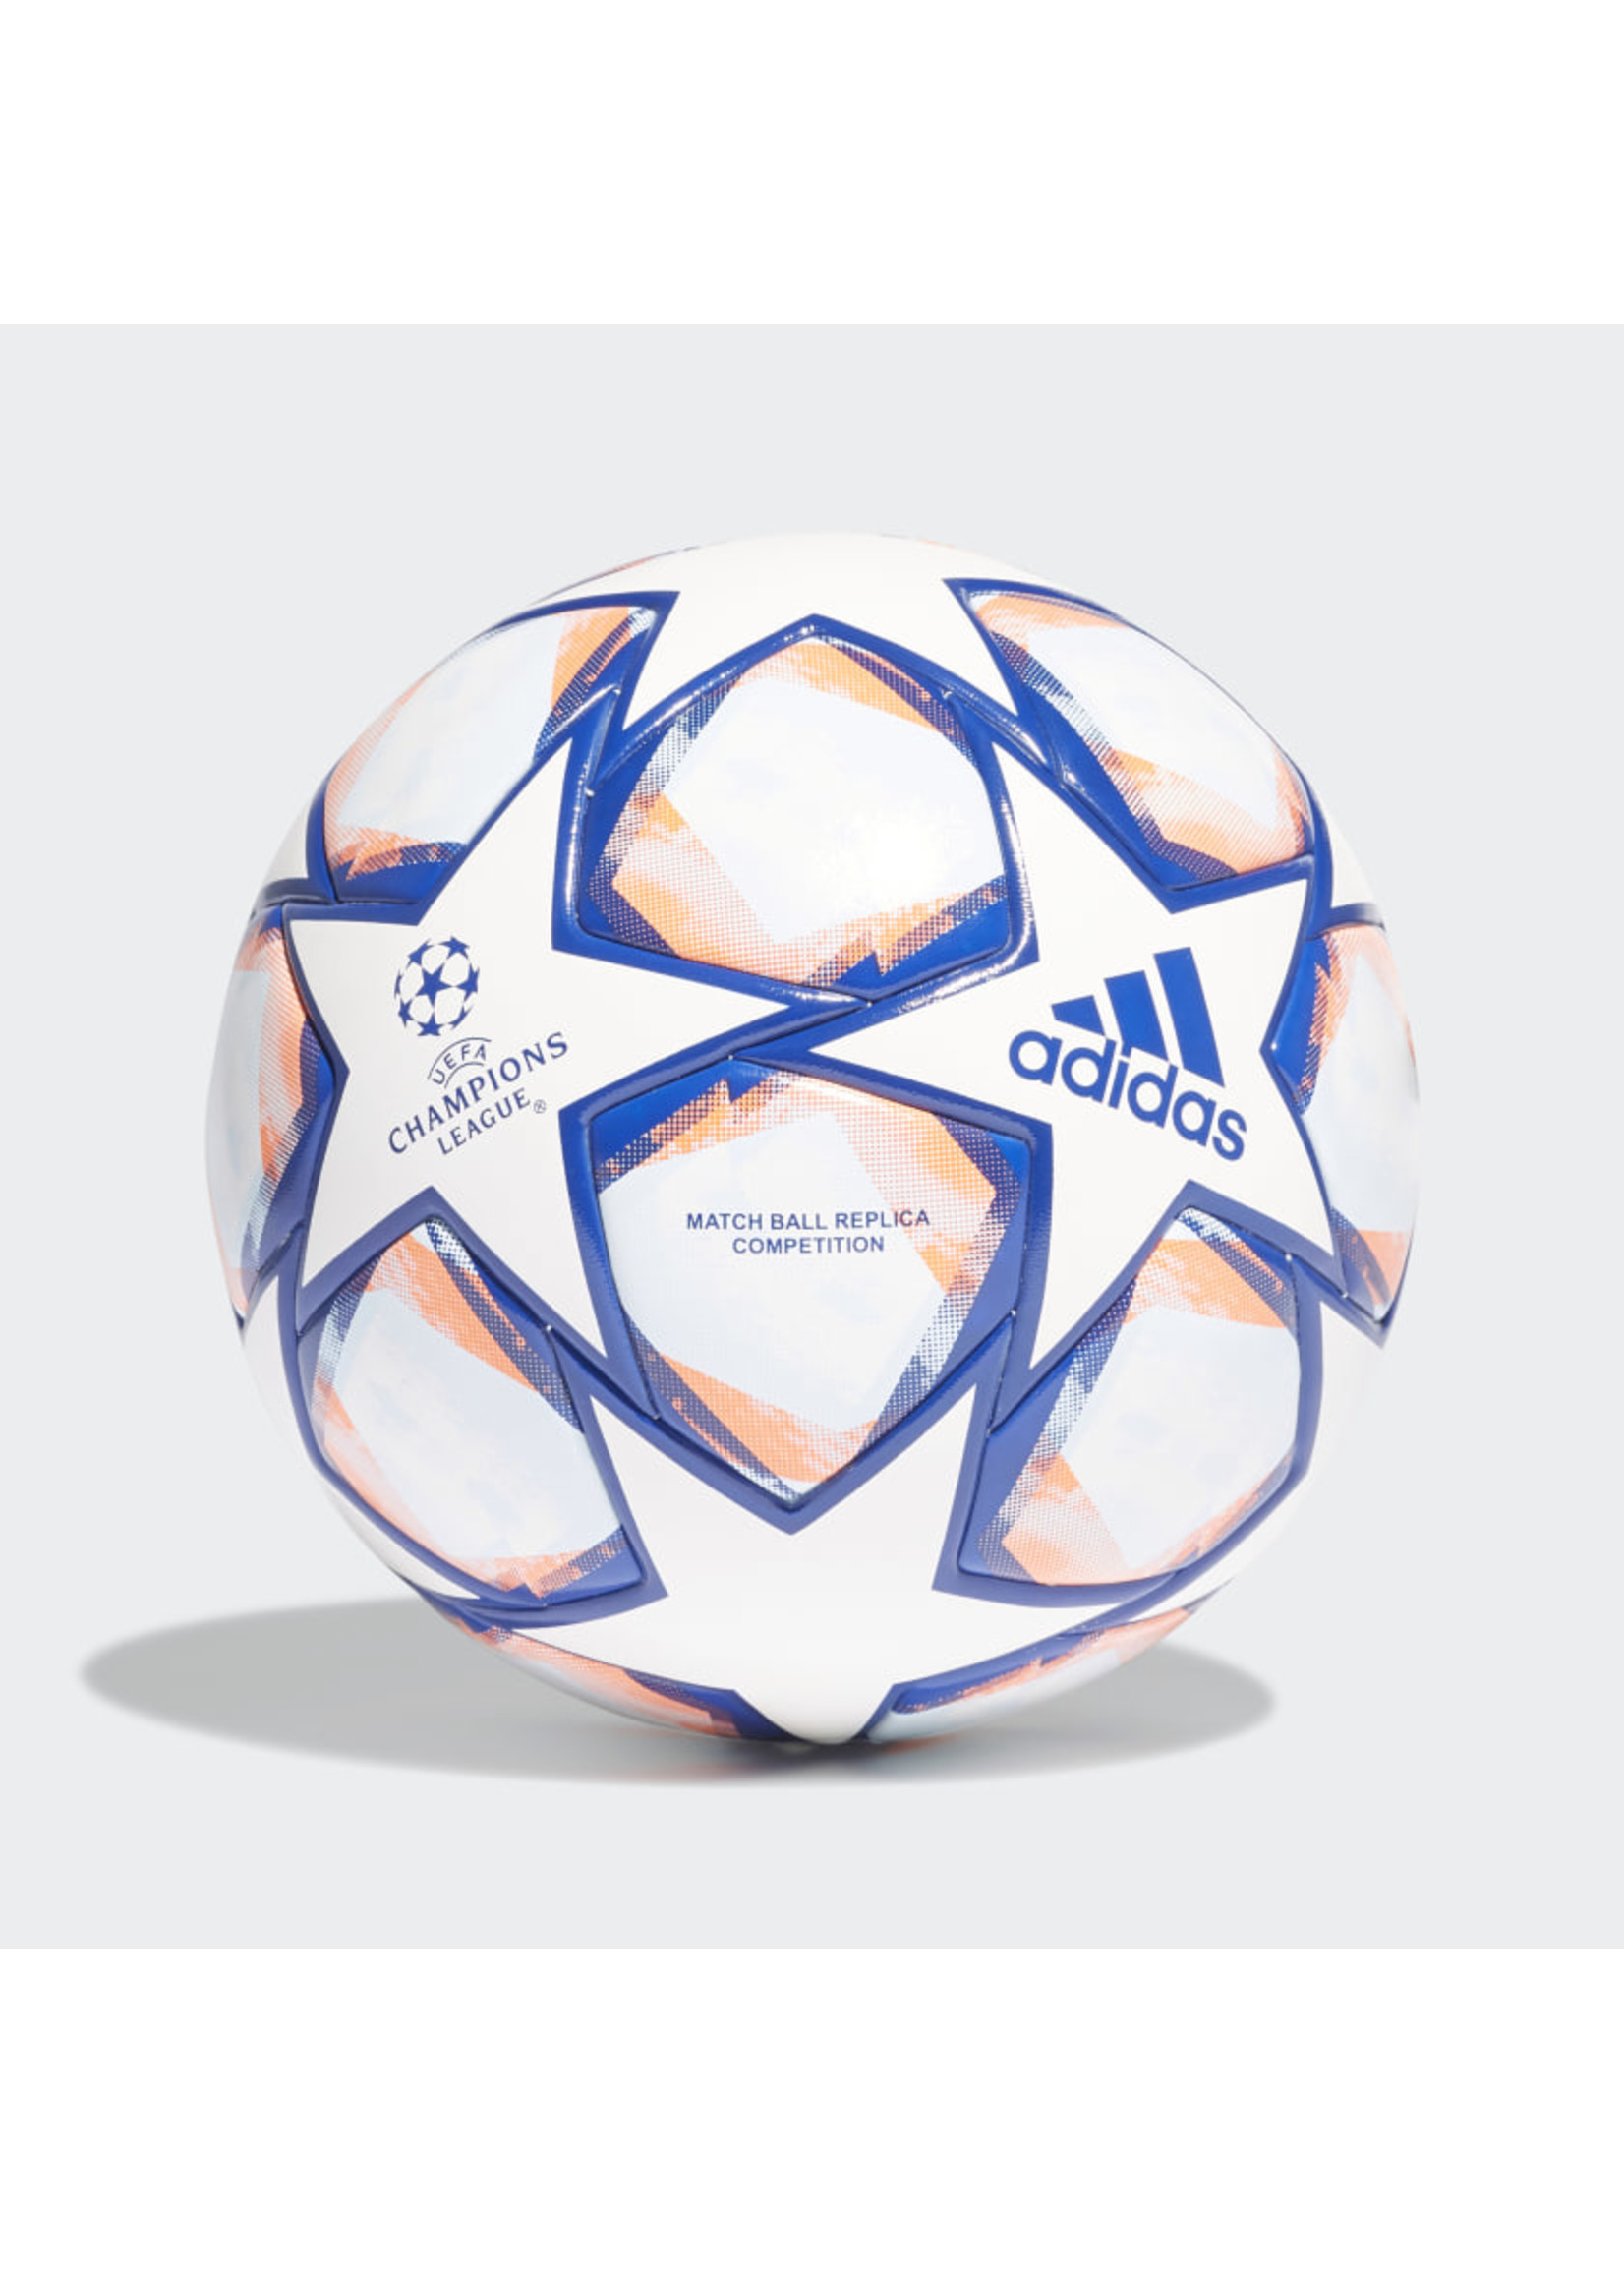 Adidas Champions League Replica Match Ball